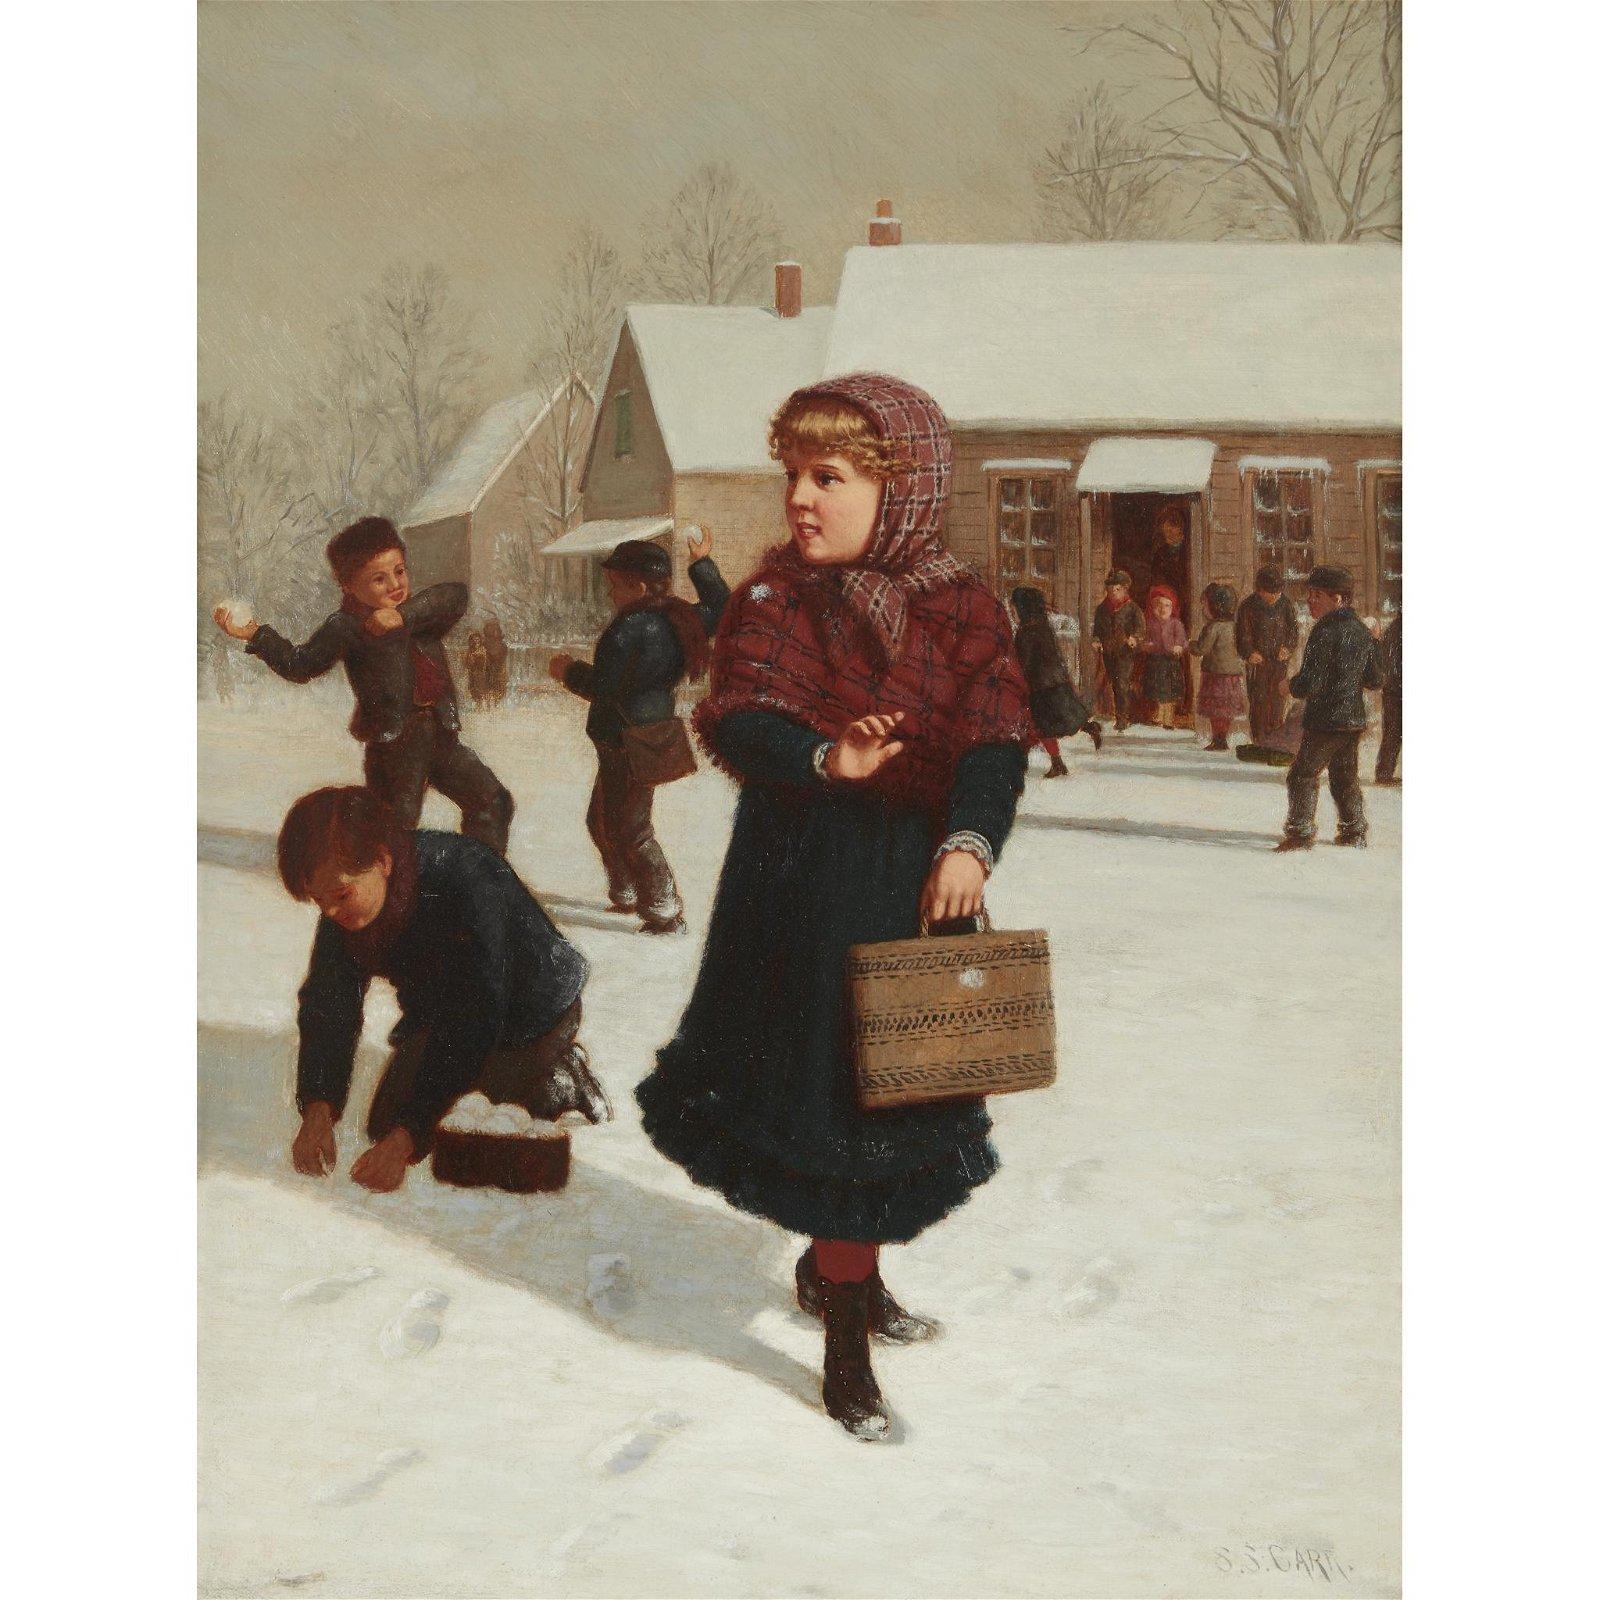 Samuel S. Carr (American, 1837-1908), , School Days